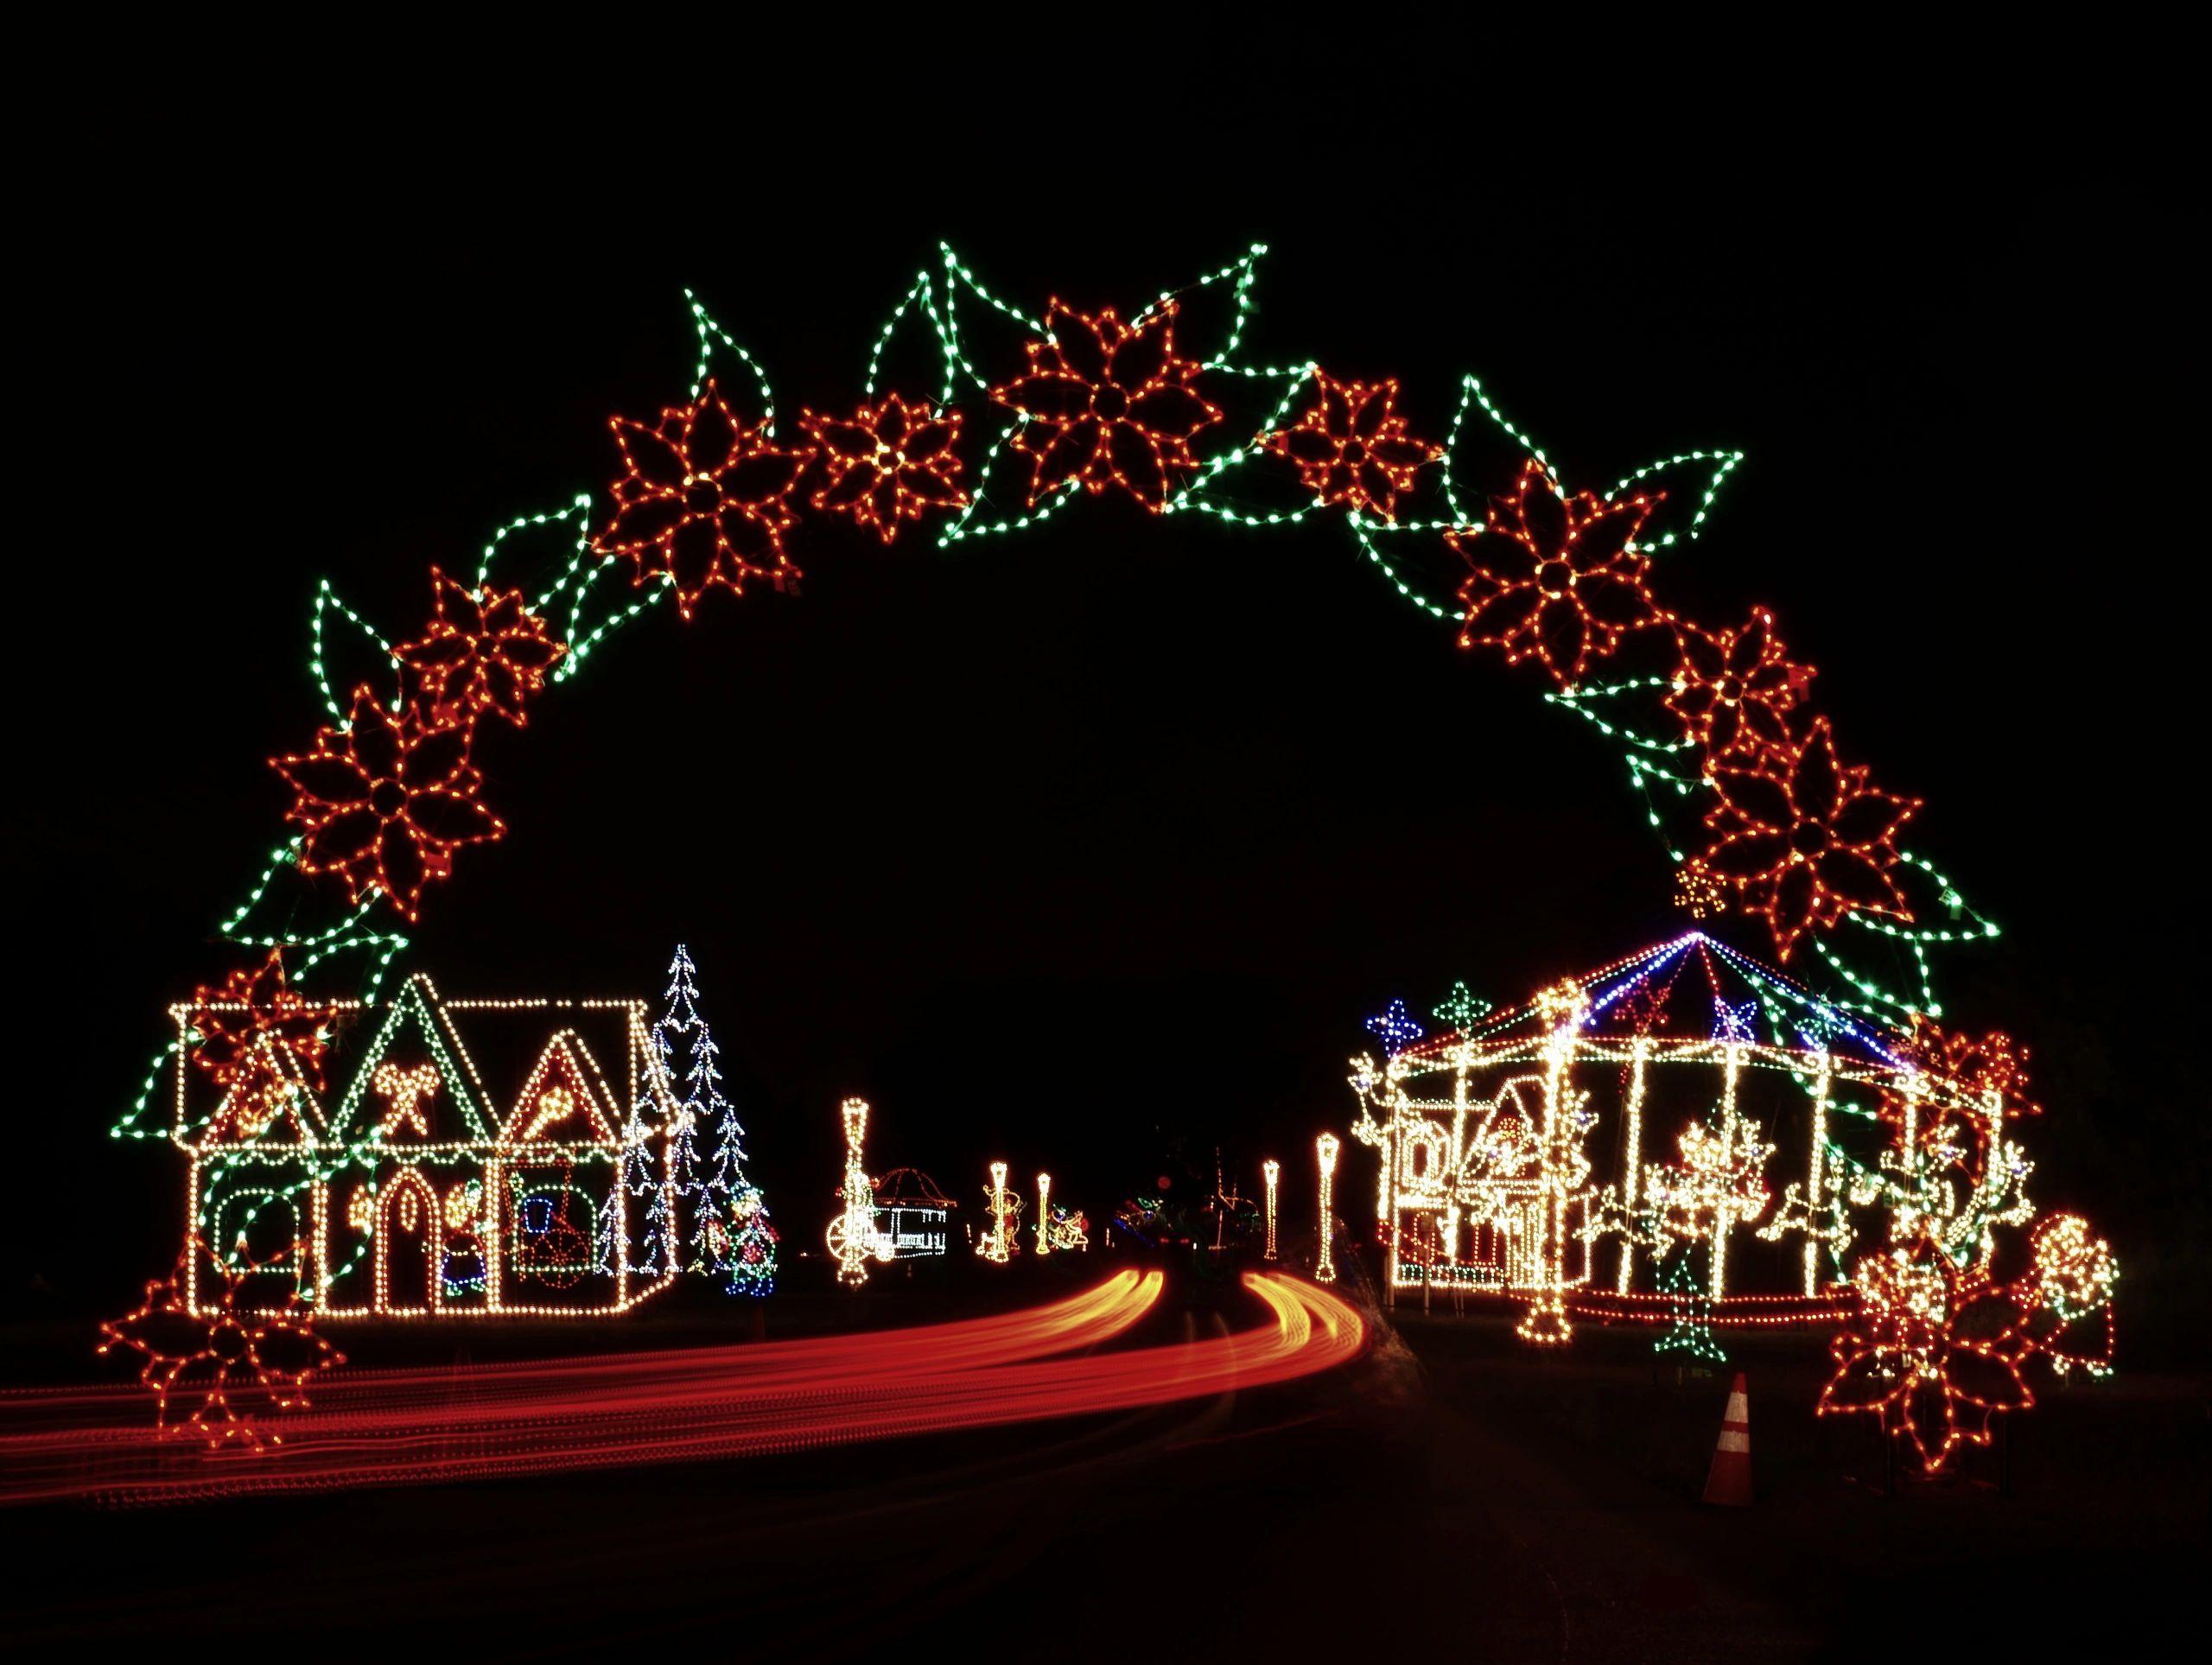 Holiday Fantasy Of Lights In 2020 Fantasy Of Lights Holiday Lights Christmas Light Displays